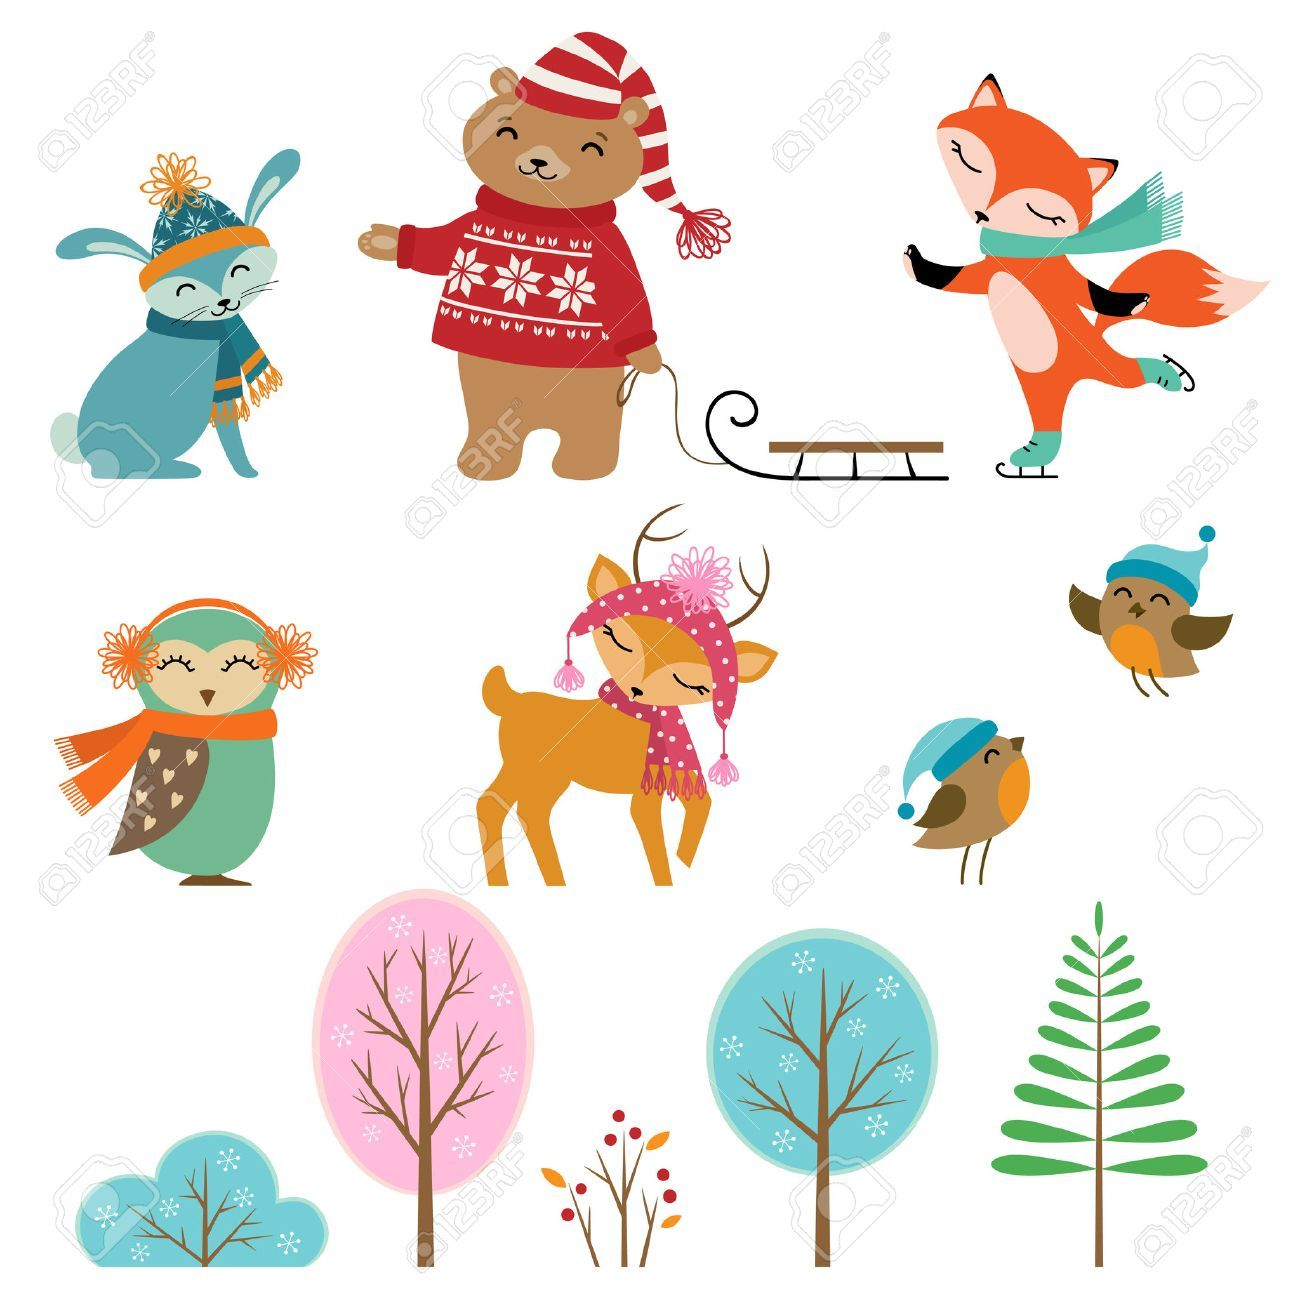 40+ Cute Winter Animals Clipart